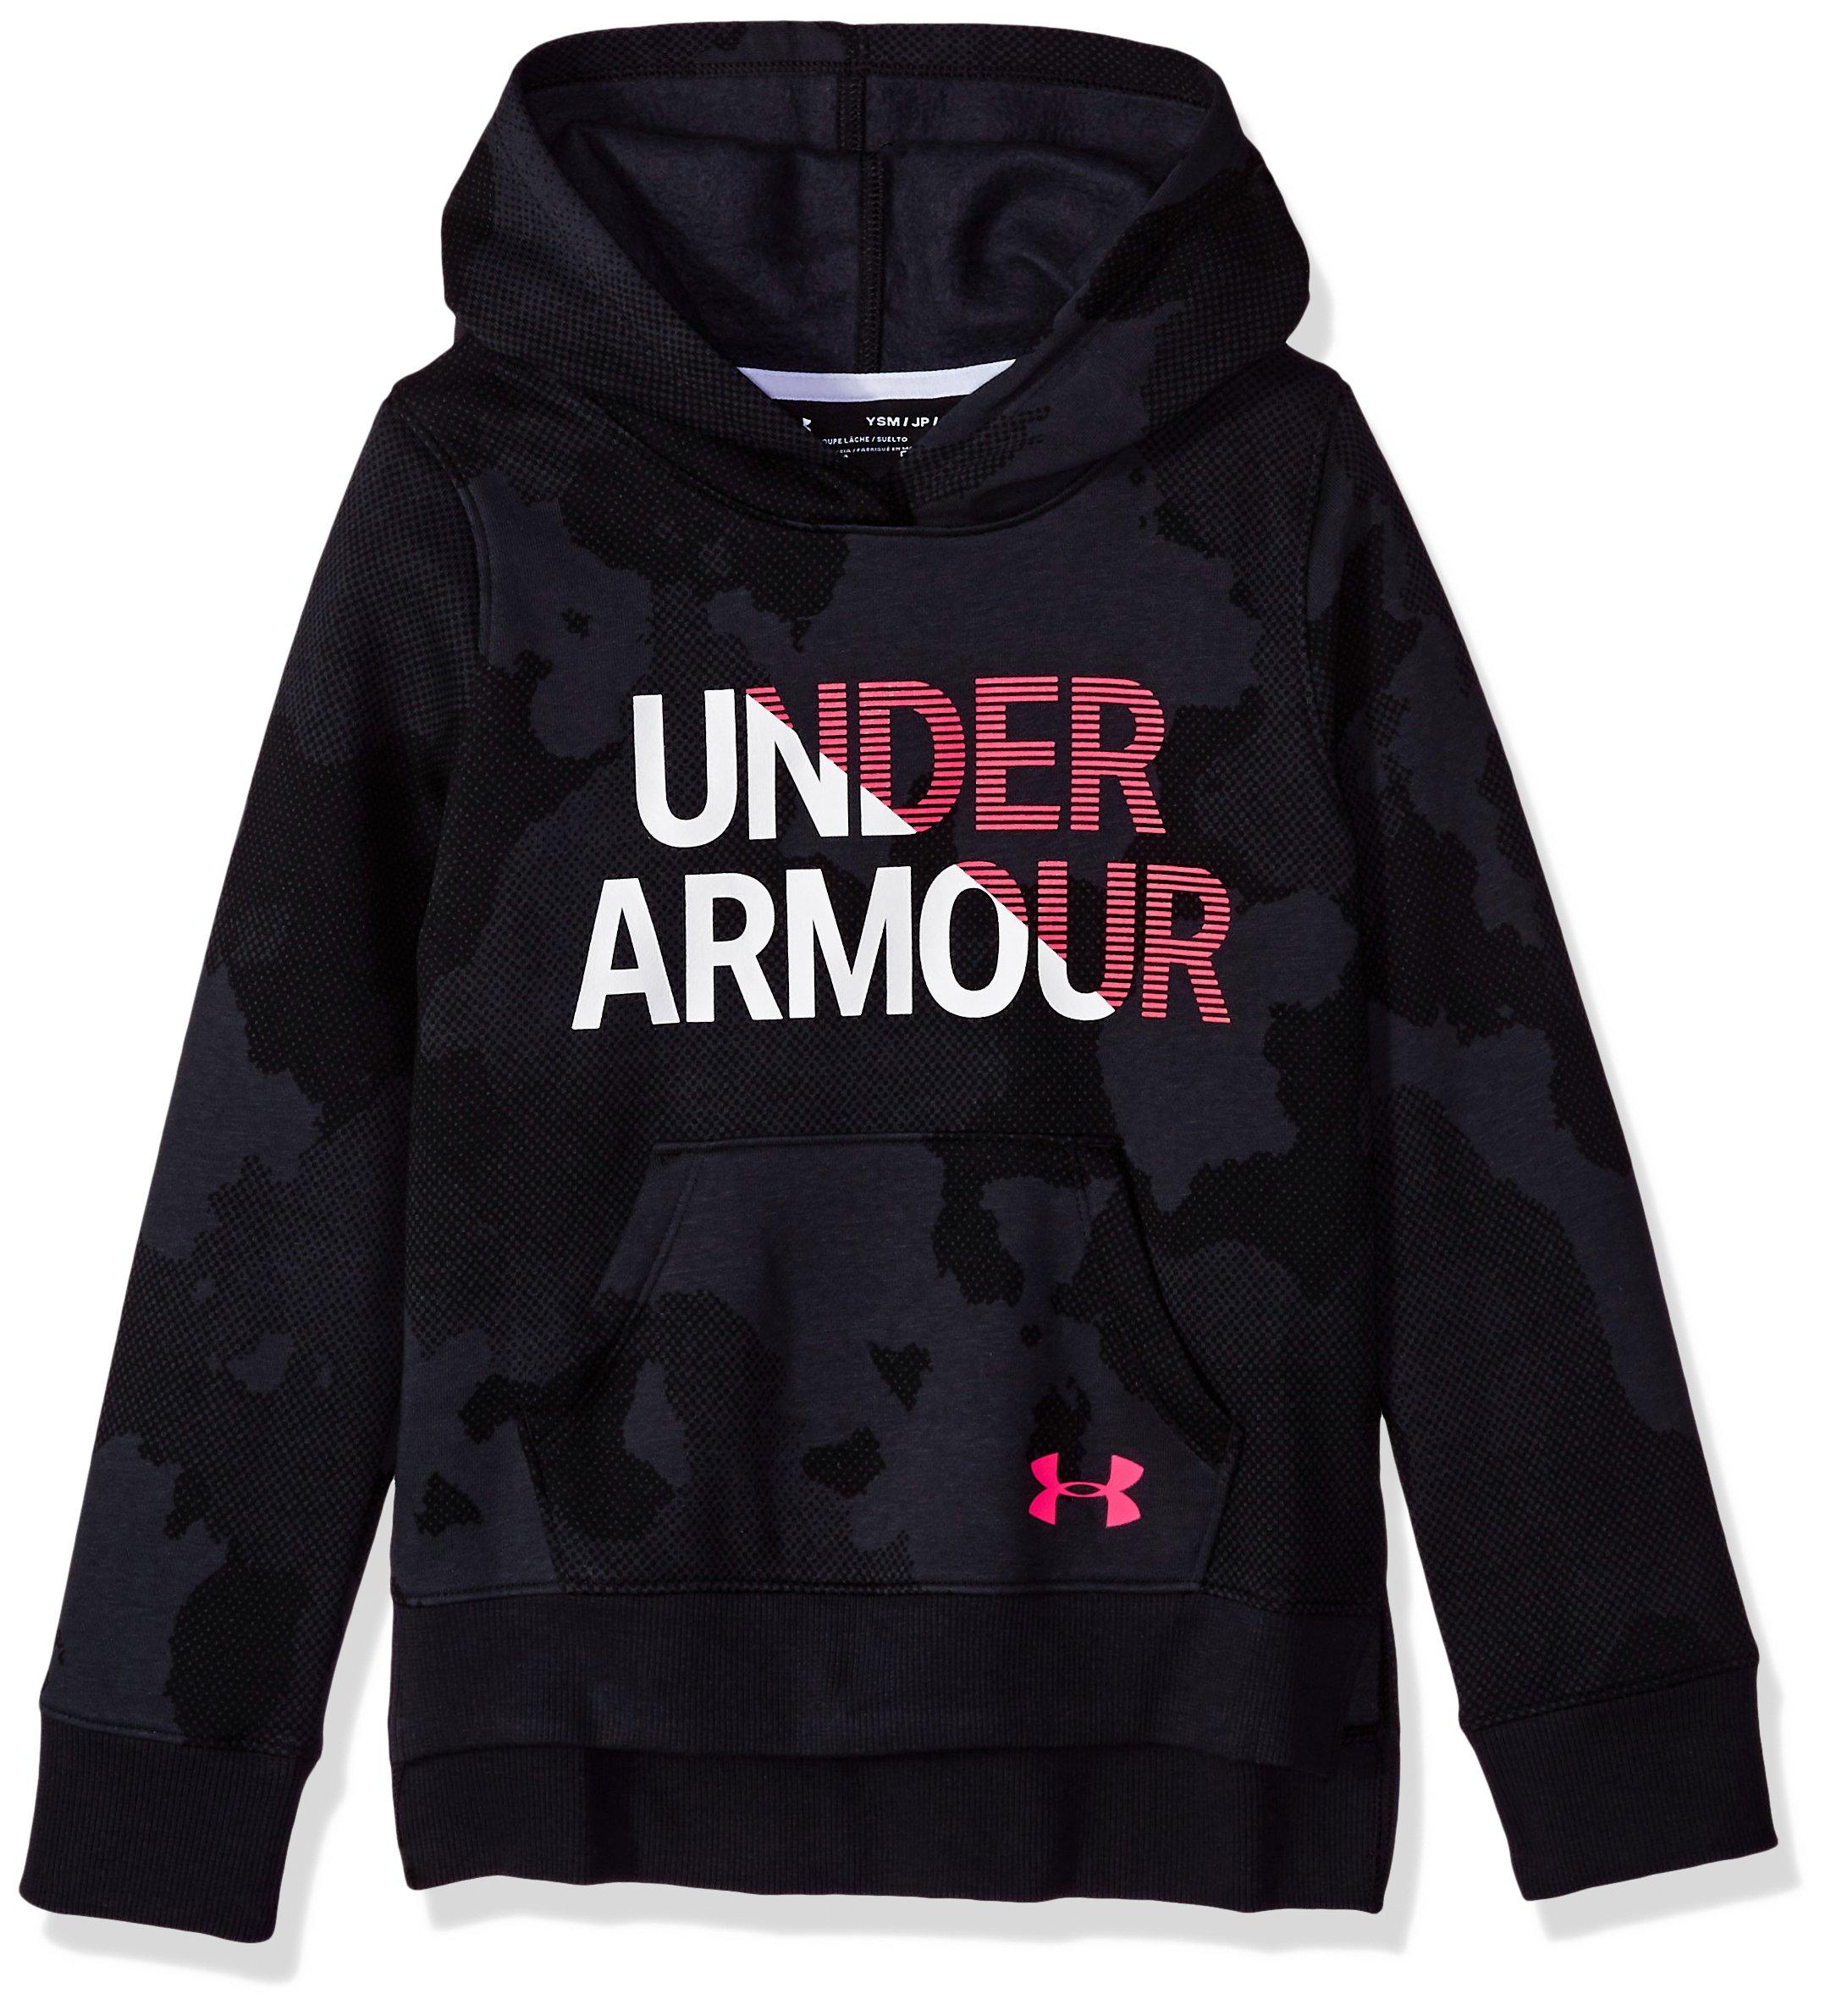 Under Armour Girls Rival Hoodie, Black (001)/Penta Pink, Medium by Under Armour